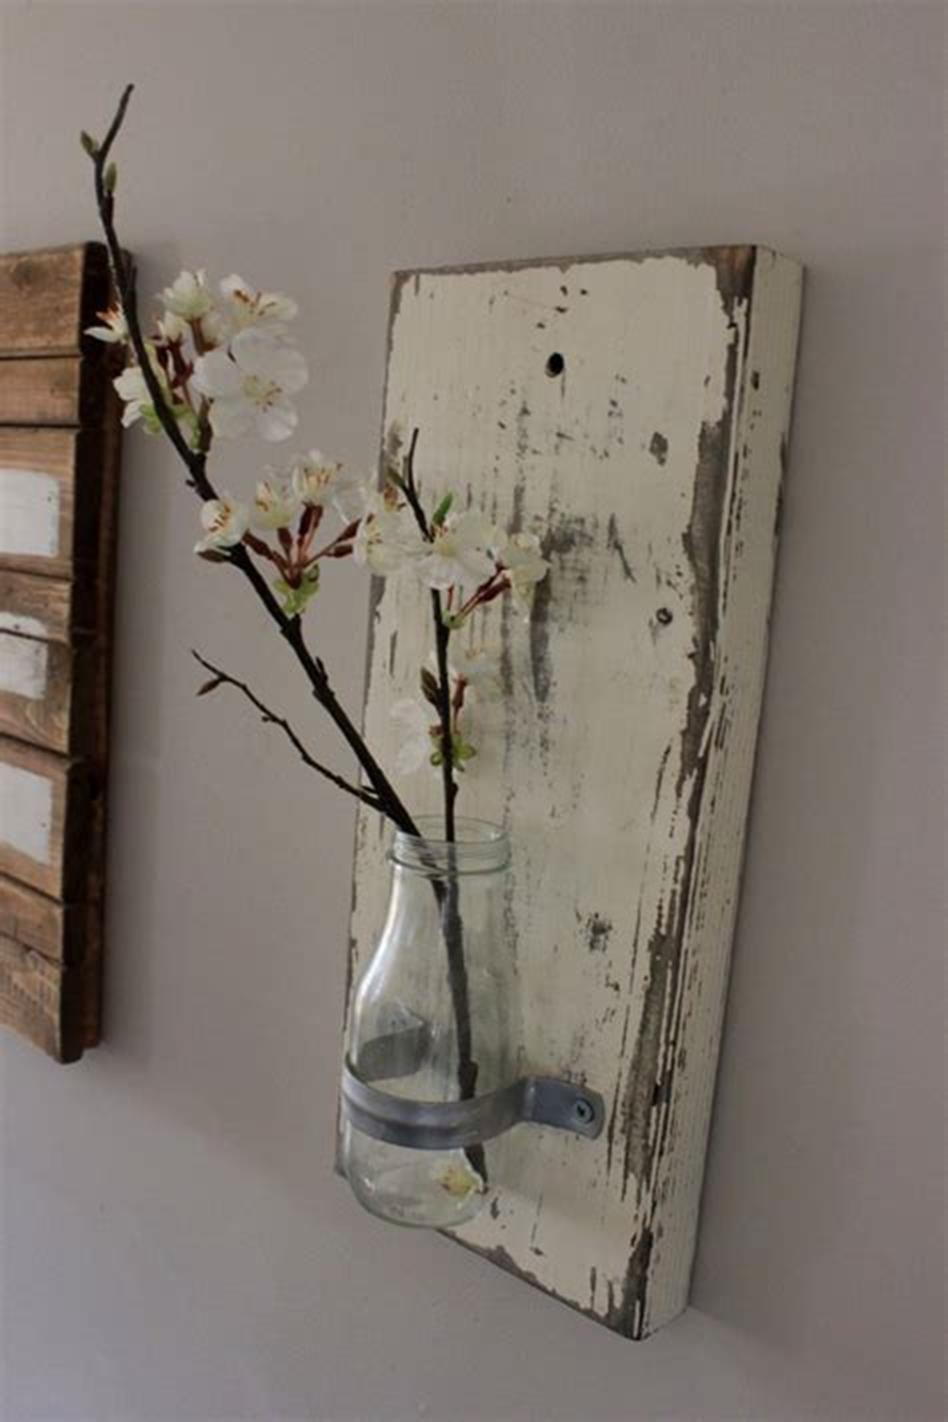 50 Diy Creative Bottle Wall Vase Arrangements Ideas Rustic Wall Decor Beautiful Dining Rooms Bottle Wall